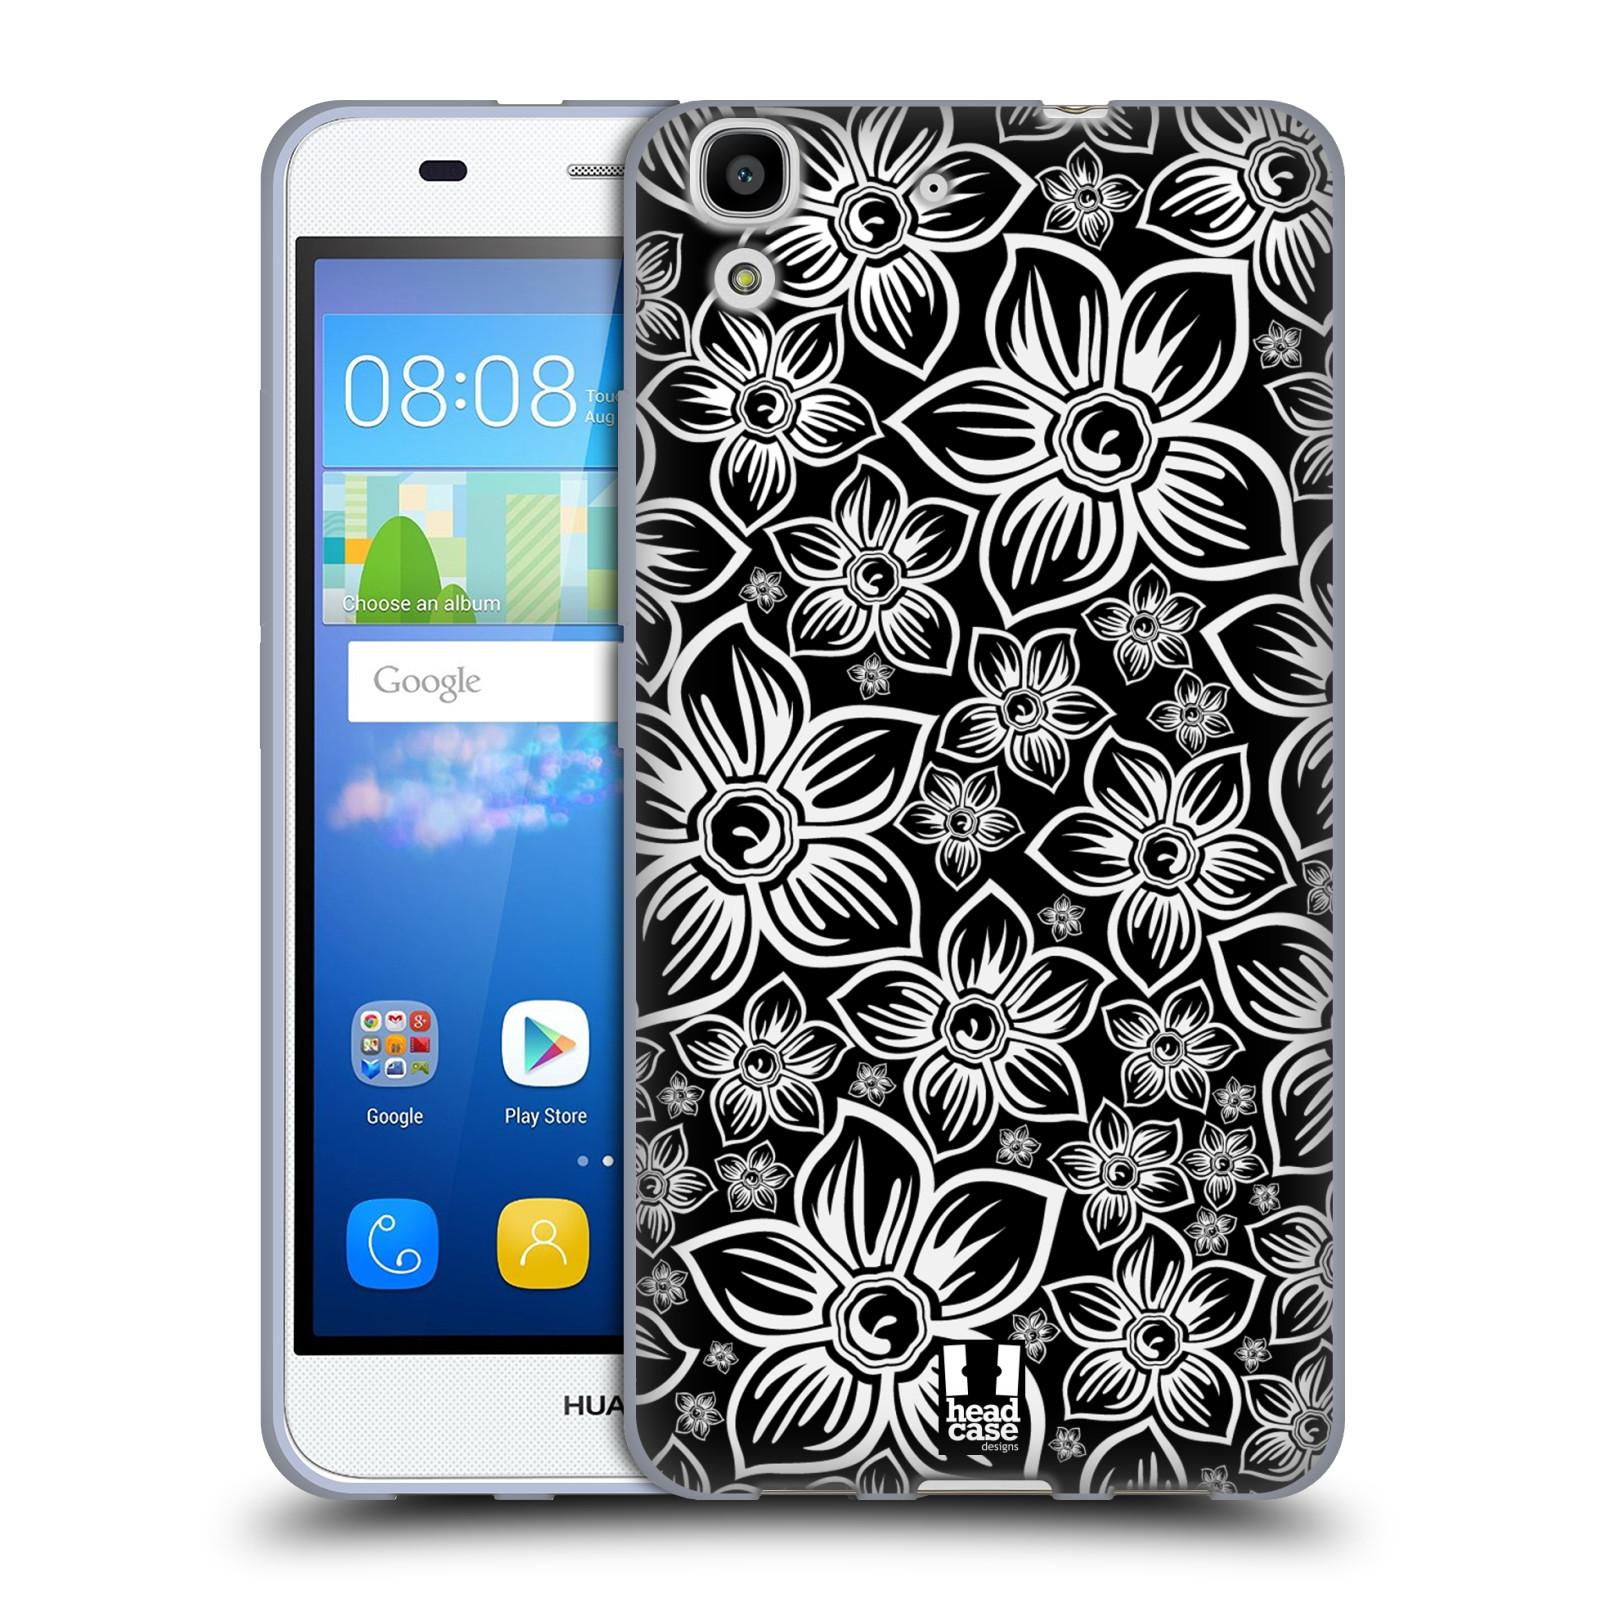 Silikonové pouzdro na mobil Huawei Y6 HEAD CASE FLORAL DAISY